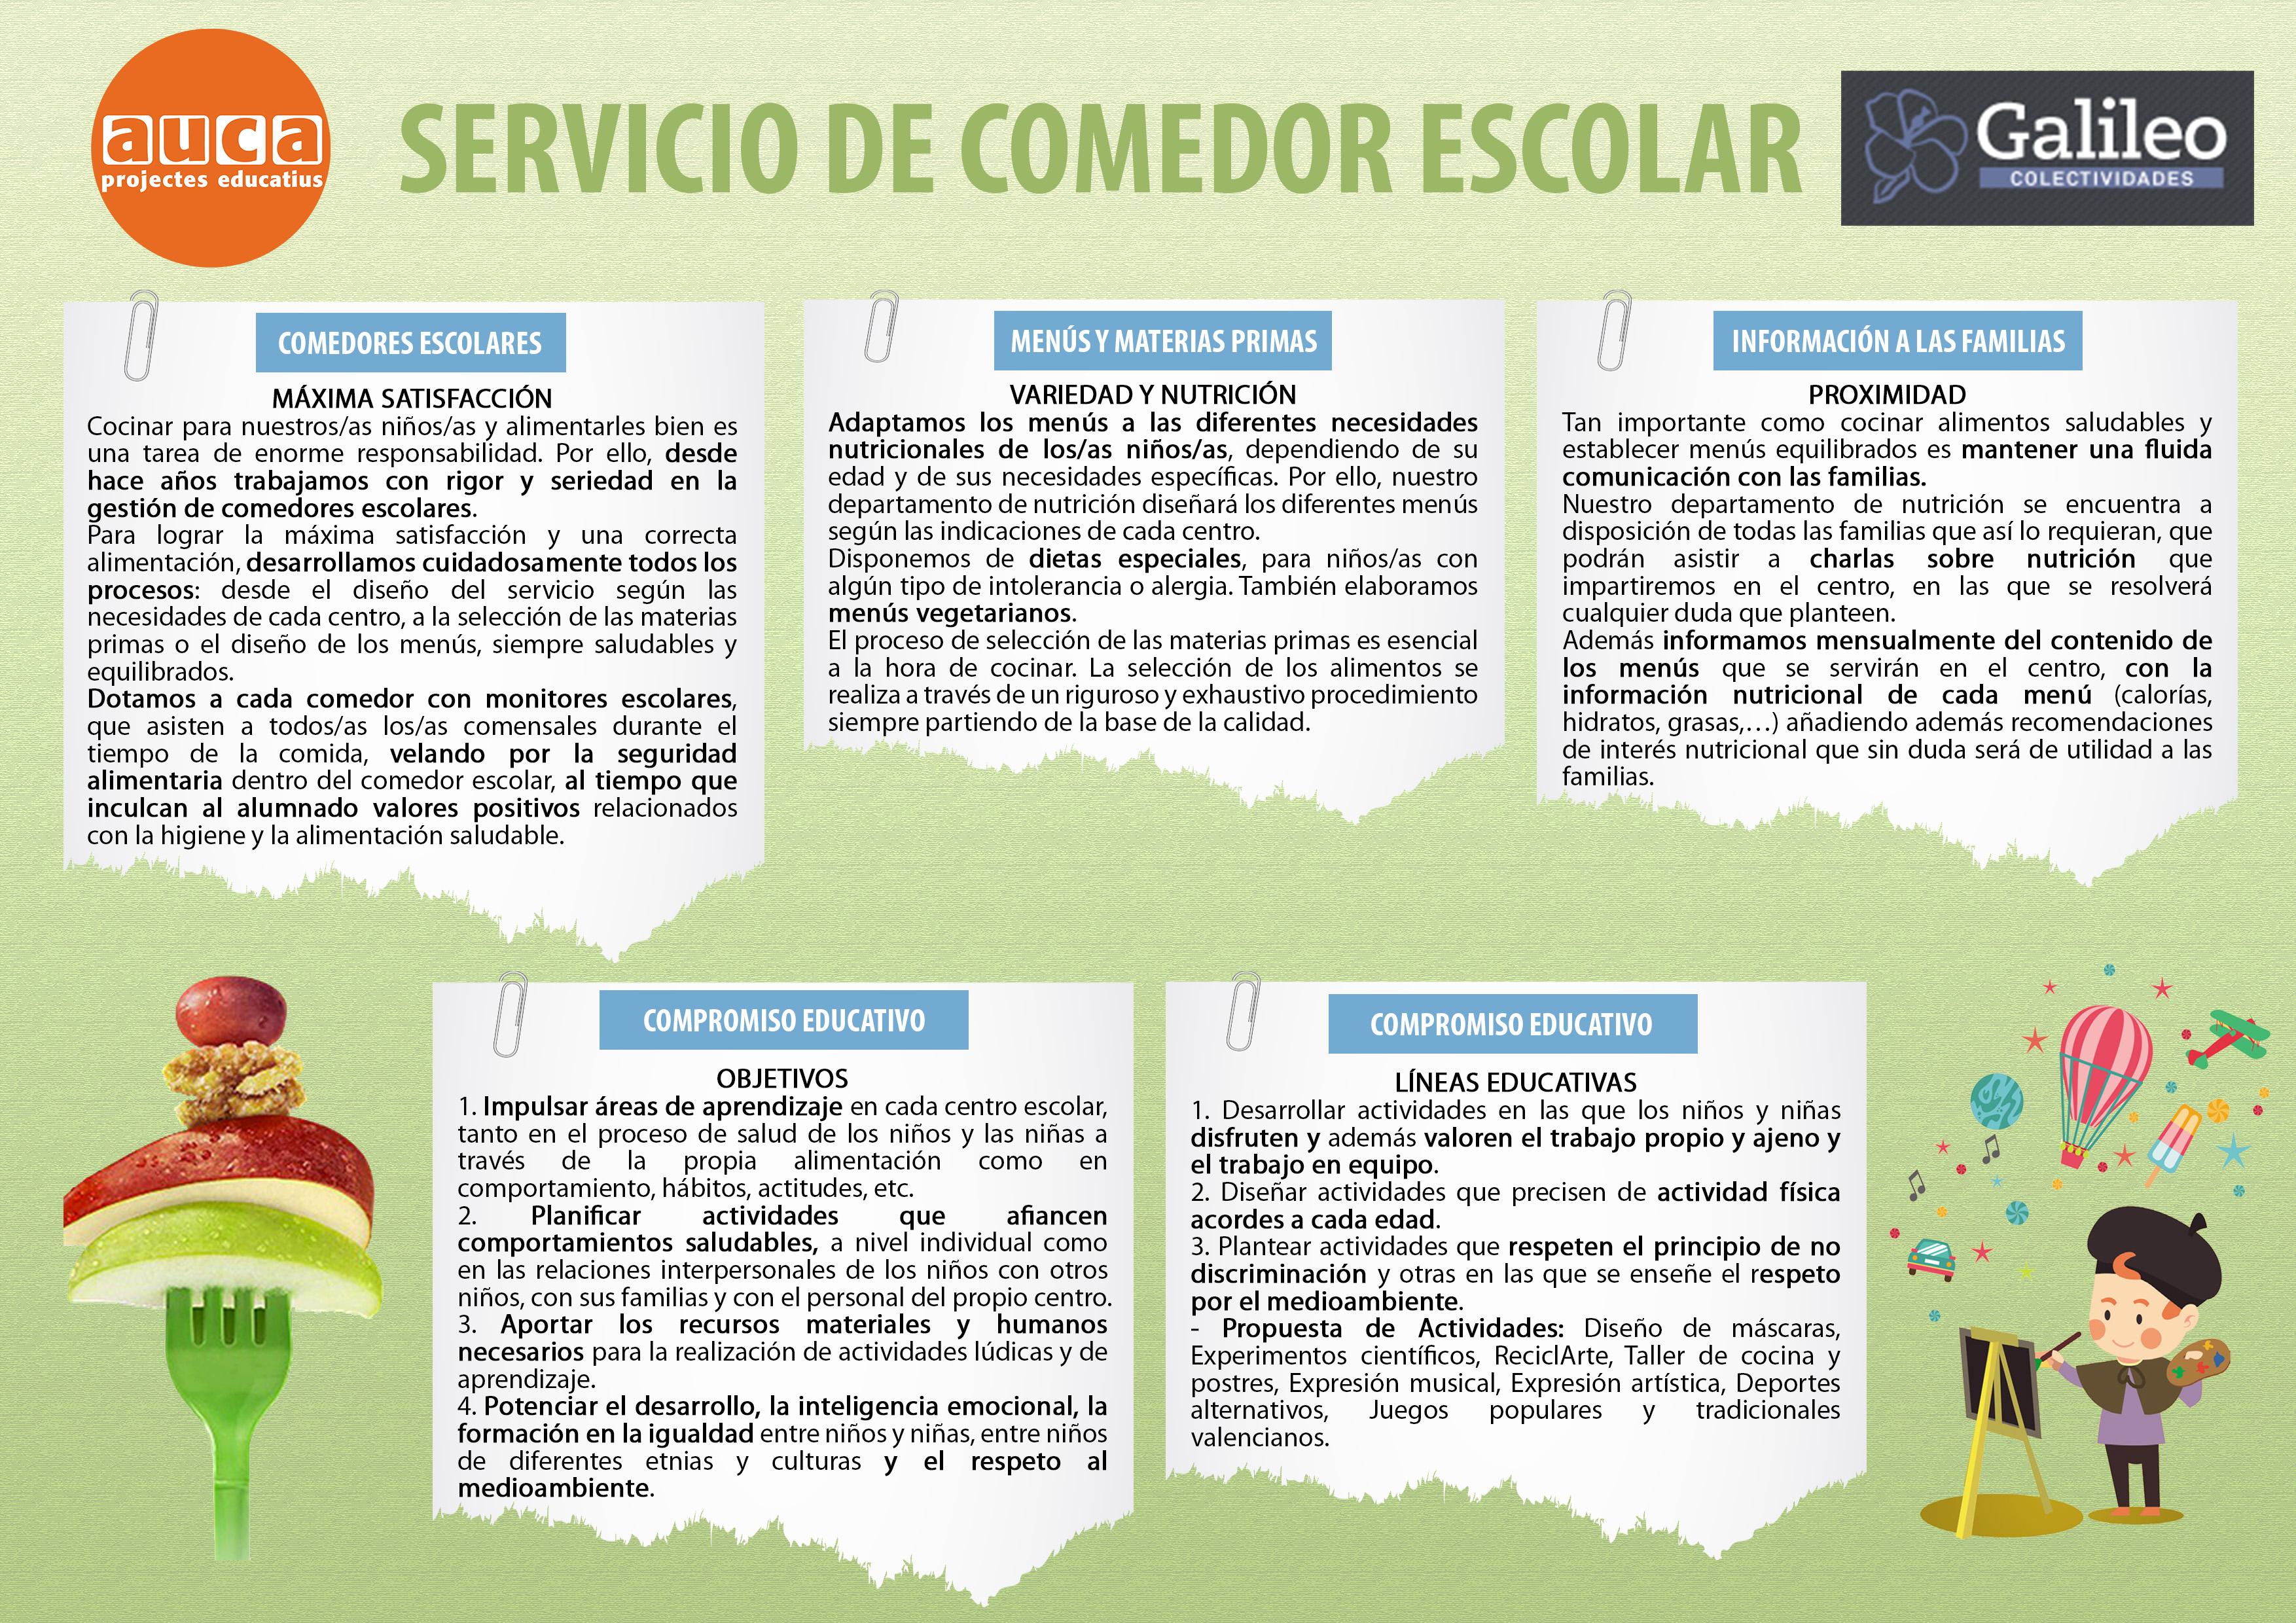 Auca projectes educatius servicios socioculturales for Trabajo de comedor escolar